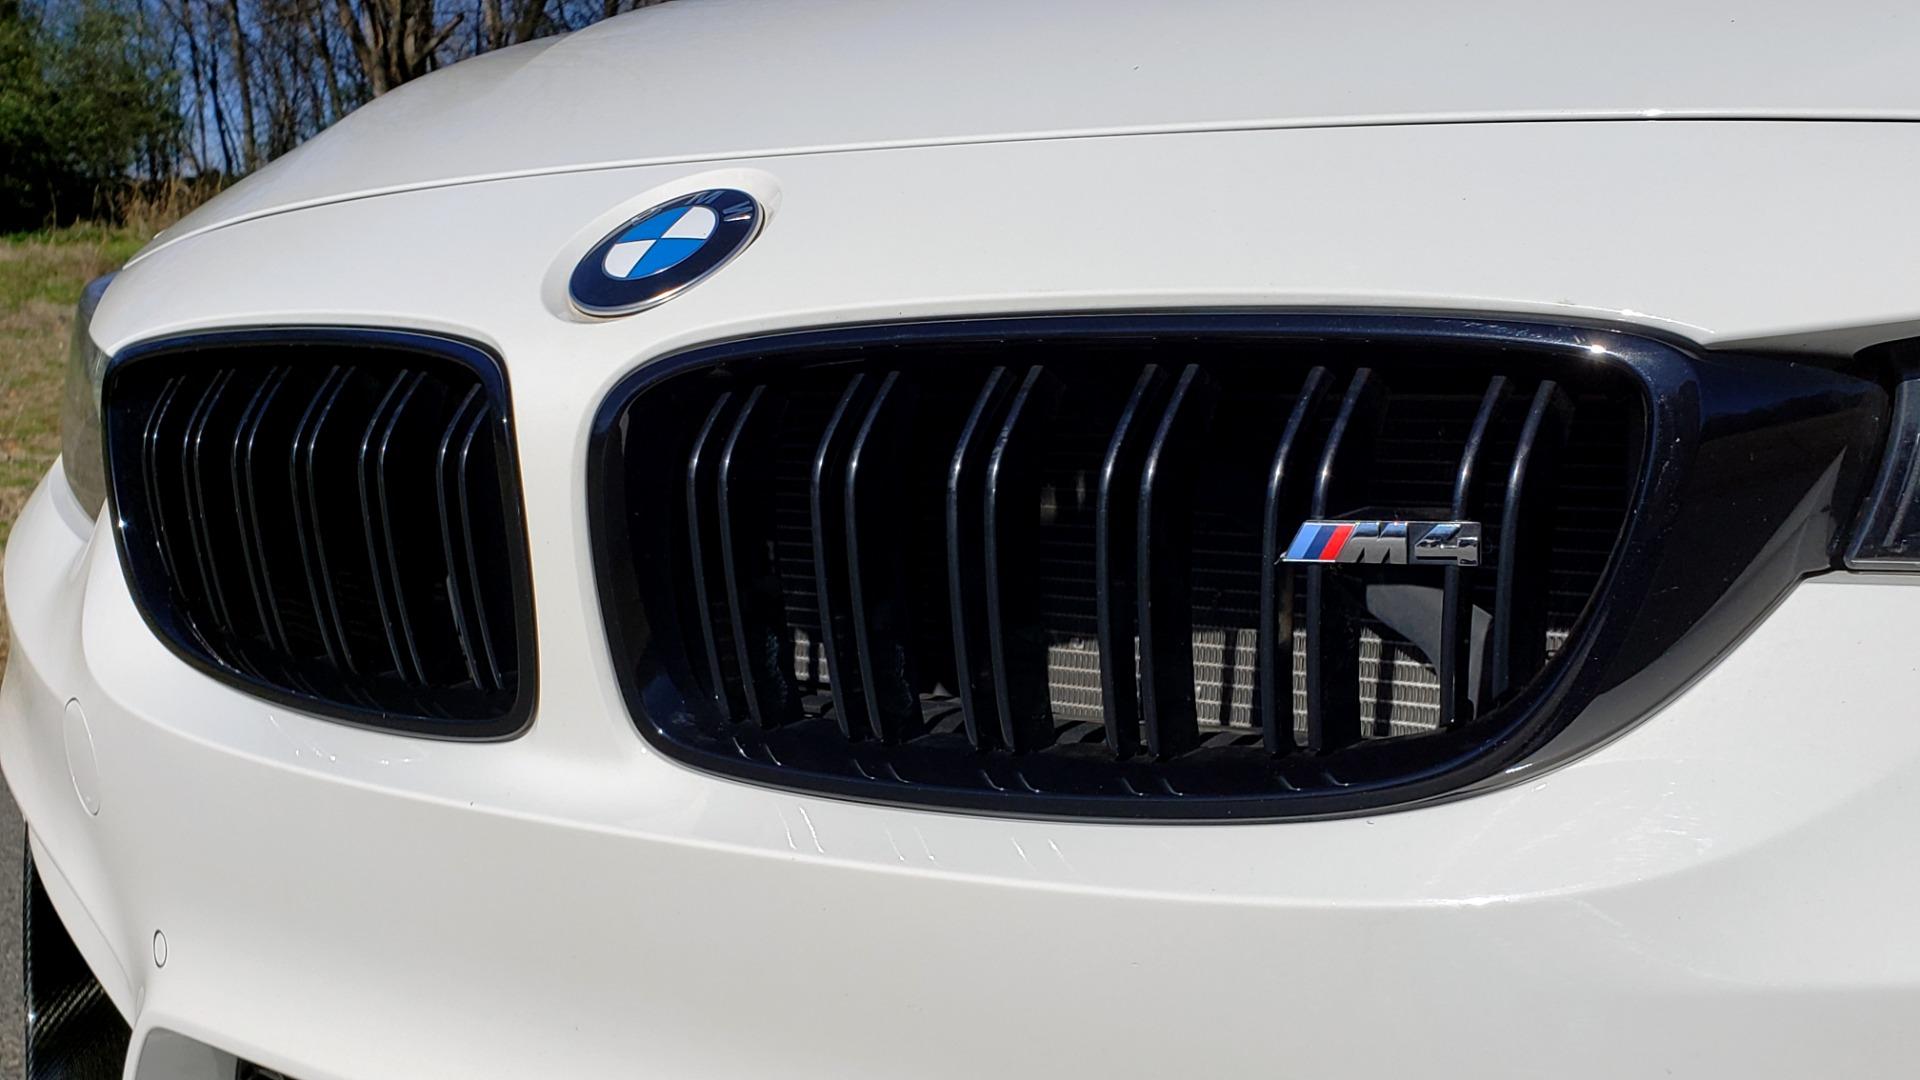 Used 2018 BMW M4 COMP PKG / EXEC / M-DRIVER / PARK CNTRL / ACTIVE BLIND SPOT for sale Sold at Formula Imports in Charlotte NC 28227 15